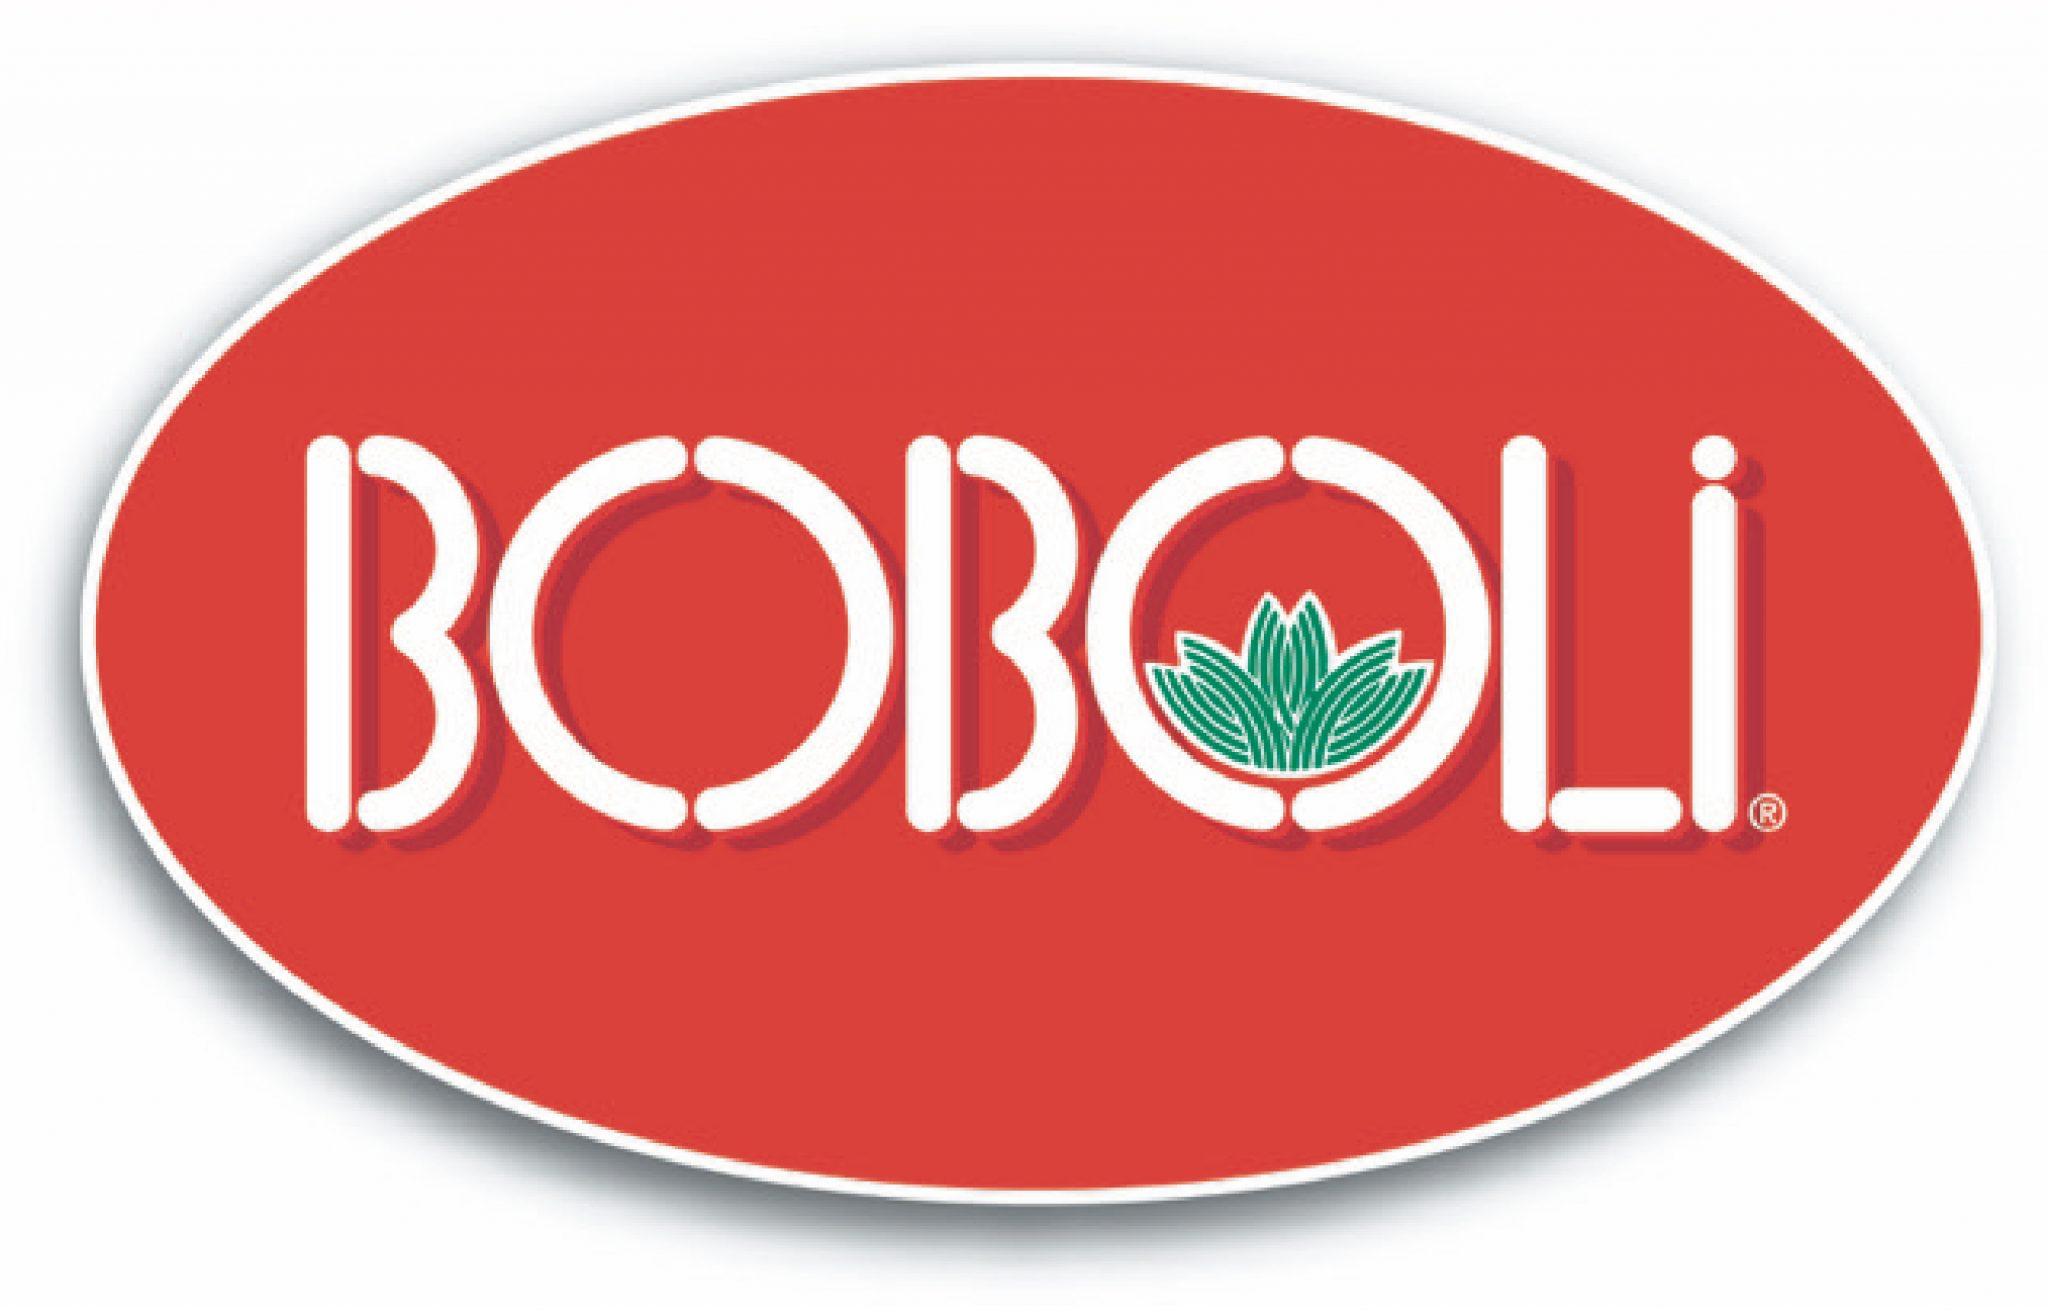 Boboli Benelux B.V.